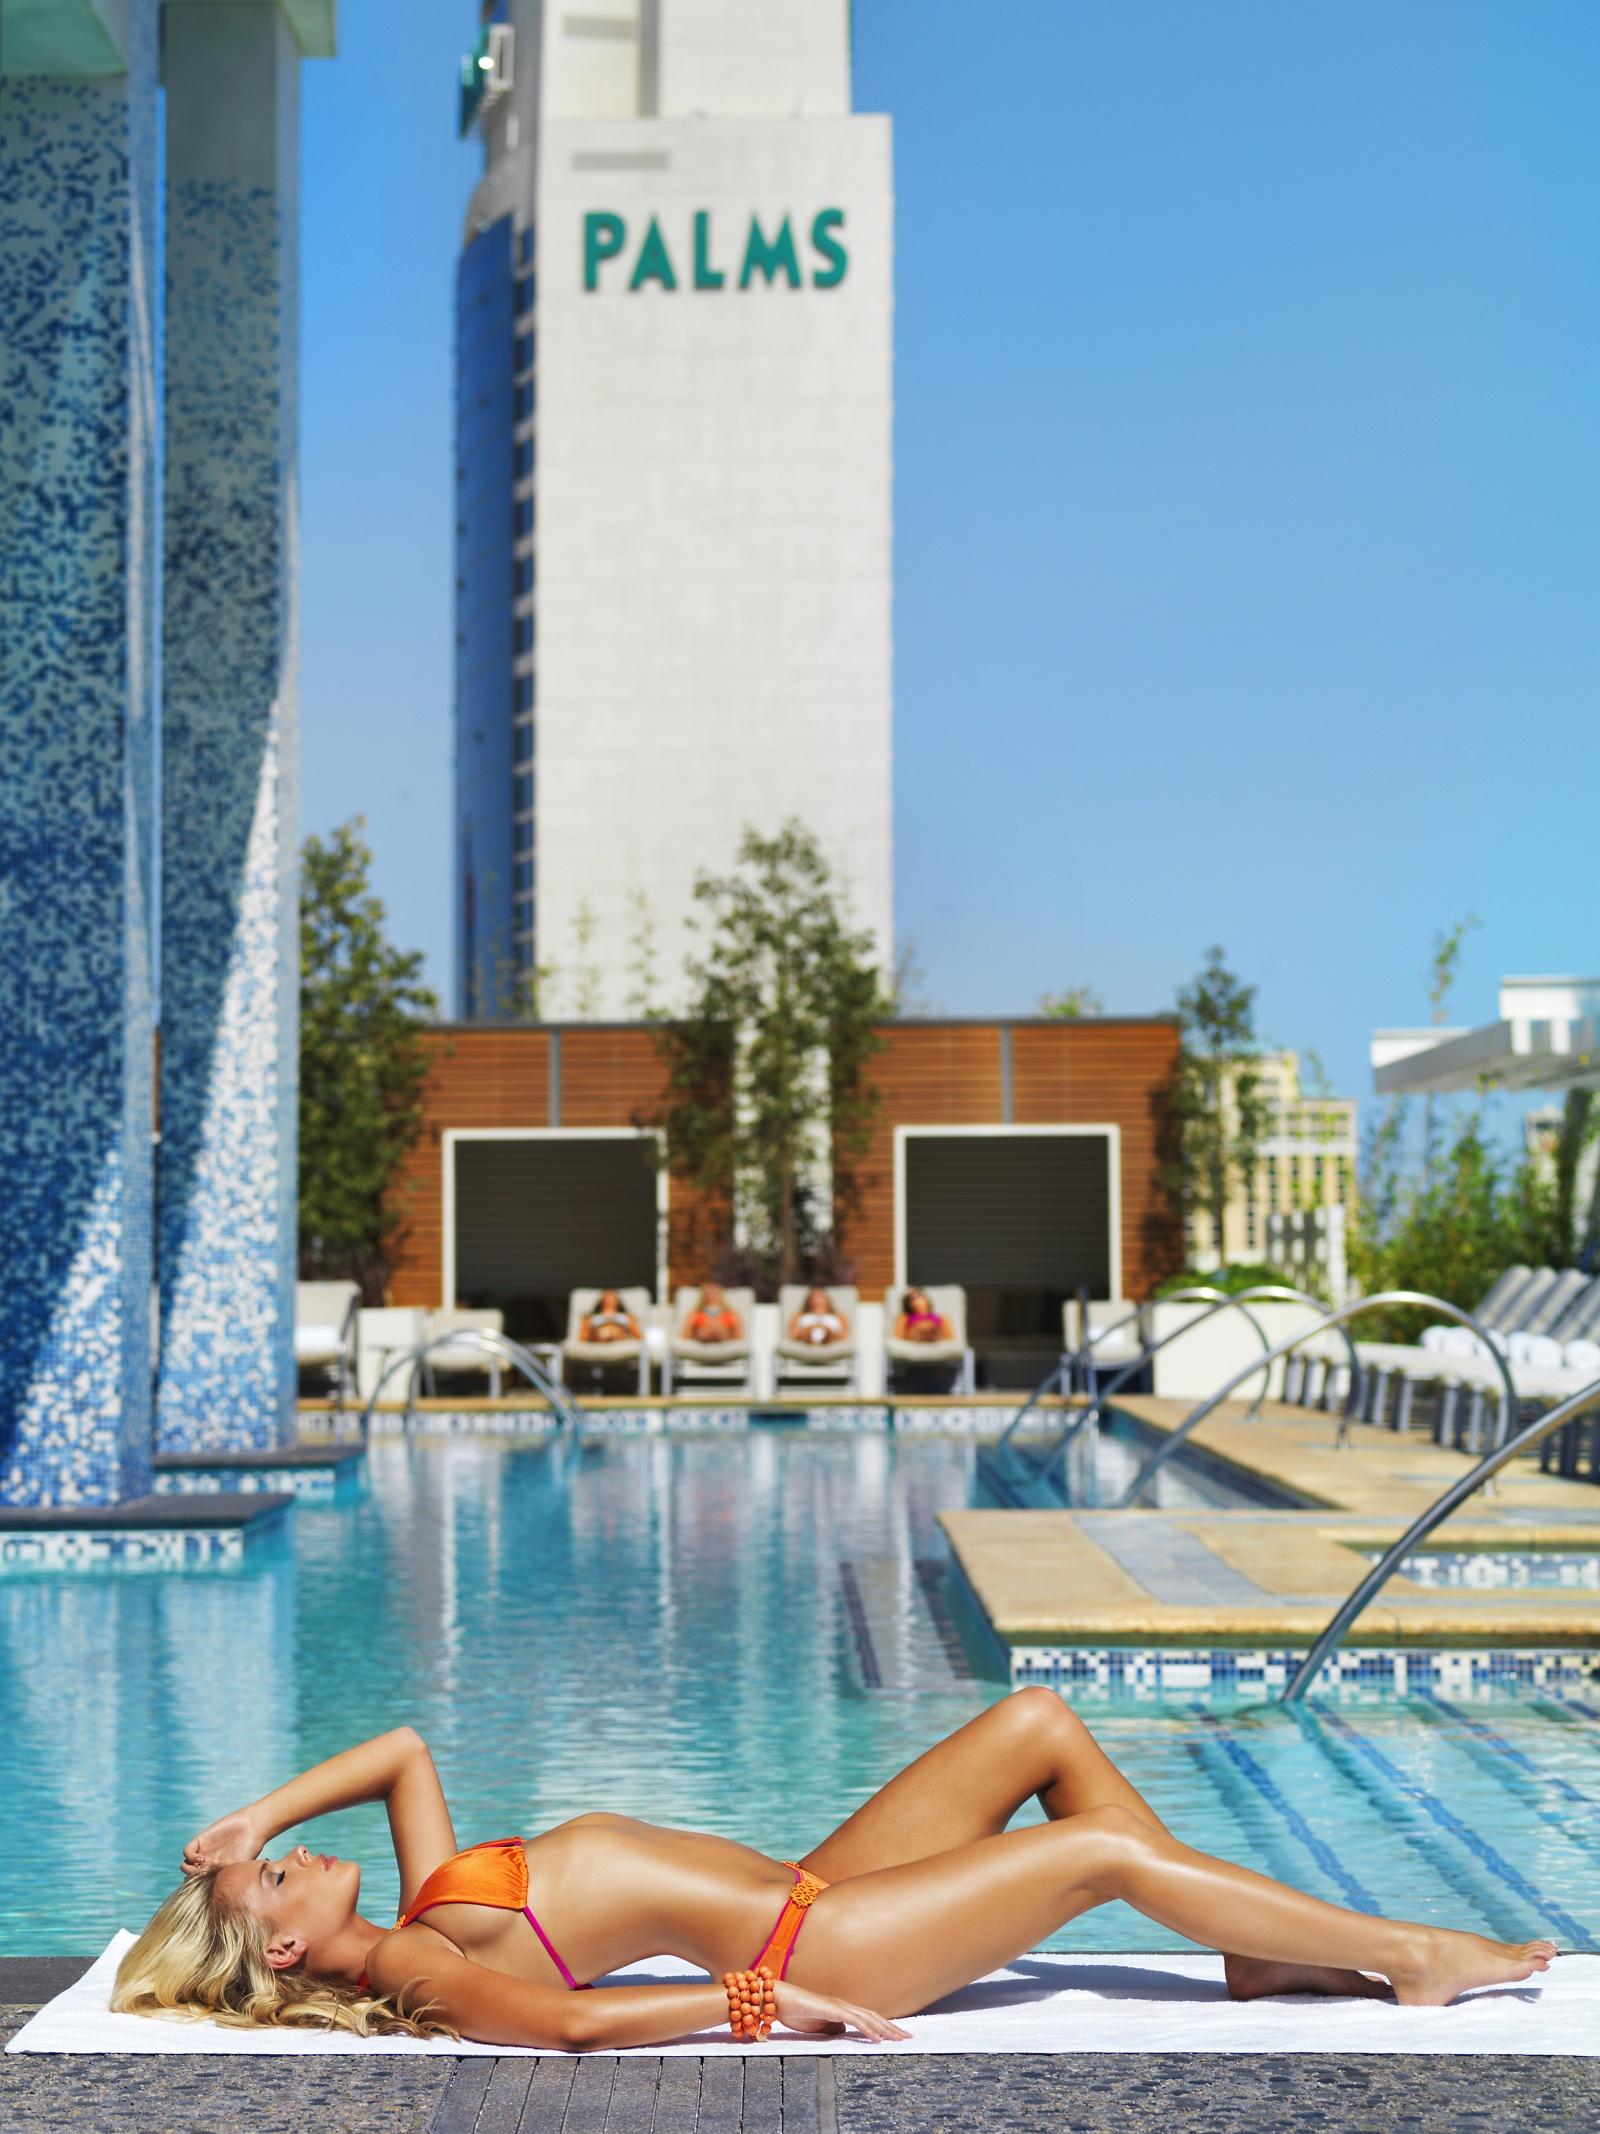 Palms casino resort las vegas for Pool spa show vegas